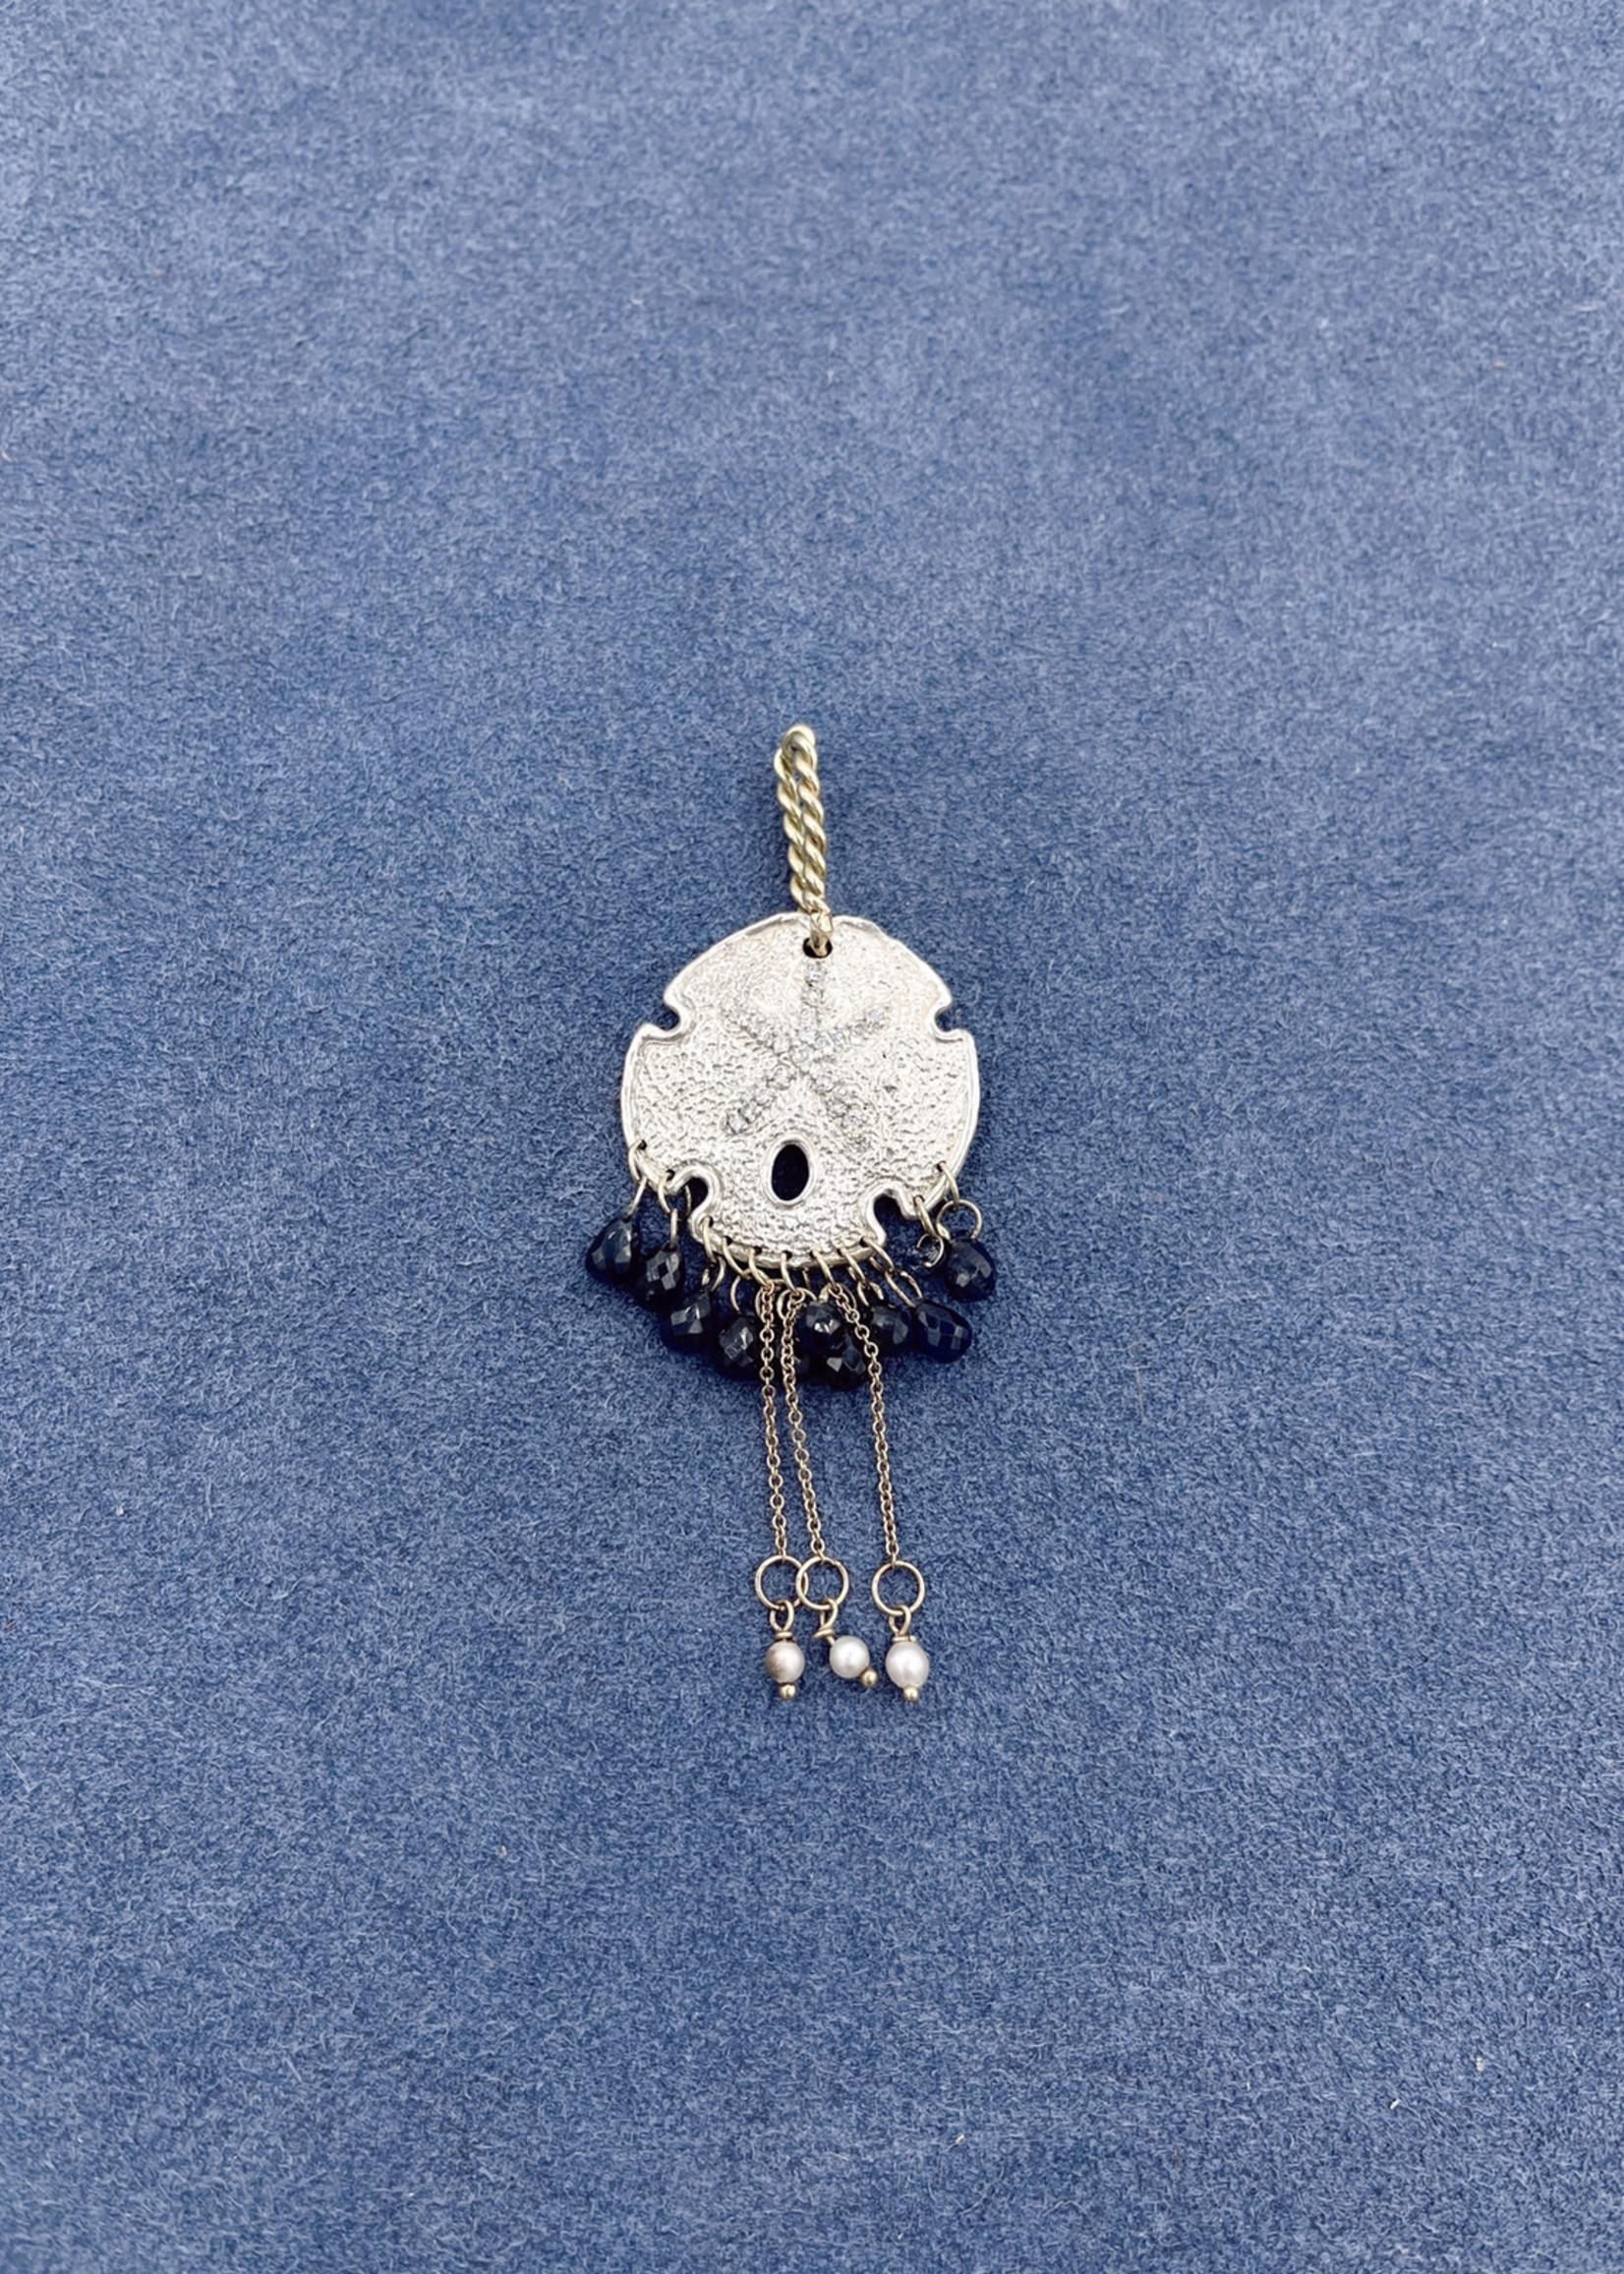 CJ Designs Sand Dollar Pendant with Sapphire, Pearl, Diamond